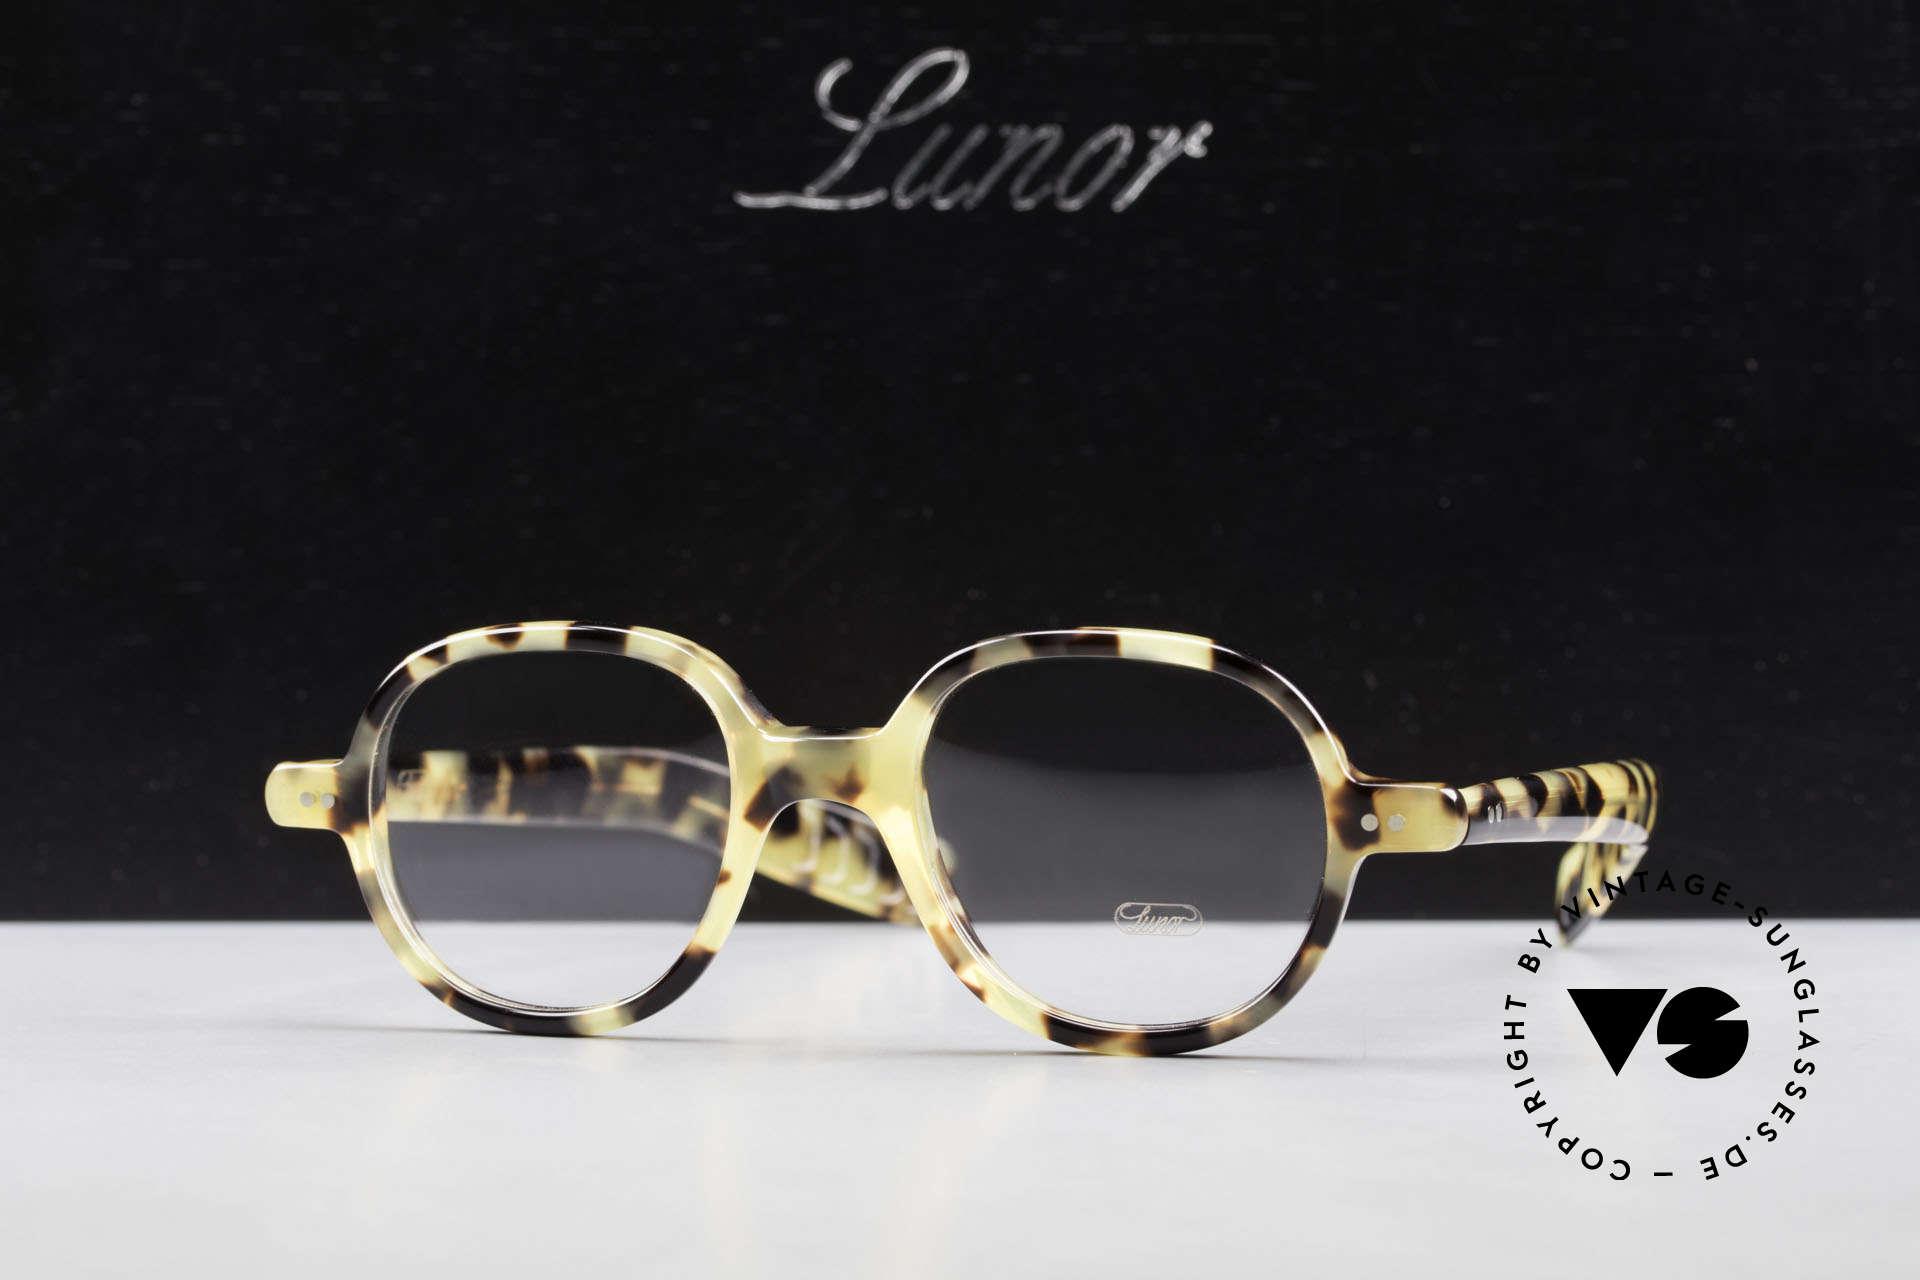 Lunor A50 Round Lunor Glasses Acetate, Size: medium, Made for Men and Women